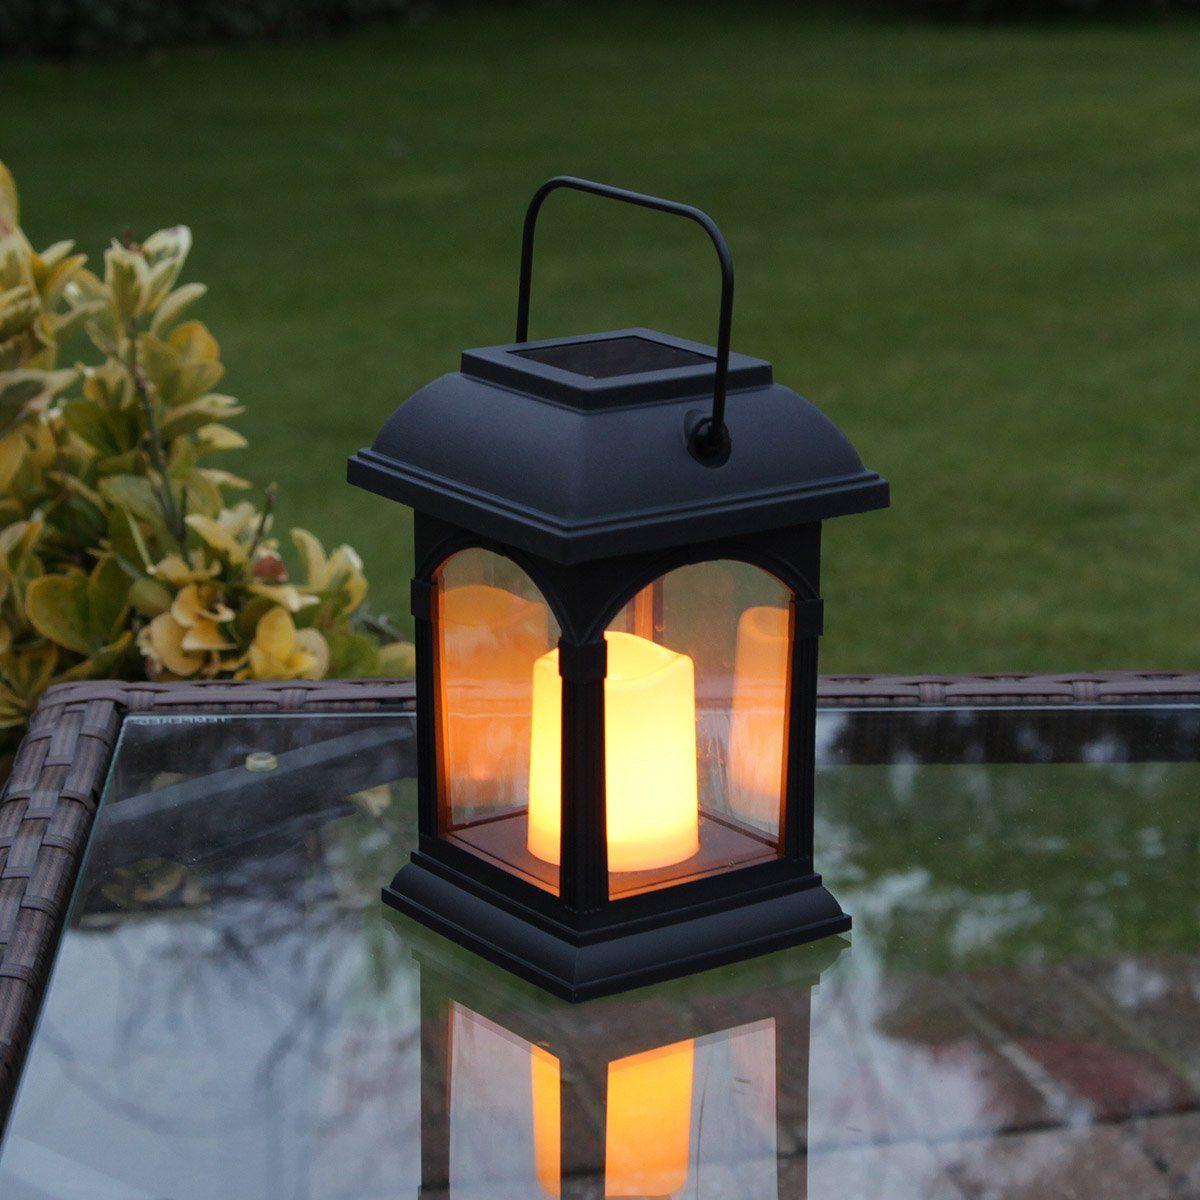 Garden Candle Lantern Solar Powered Flickering Effect